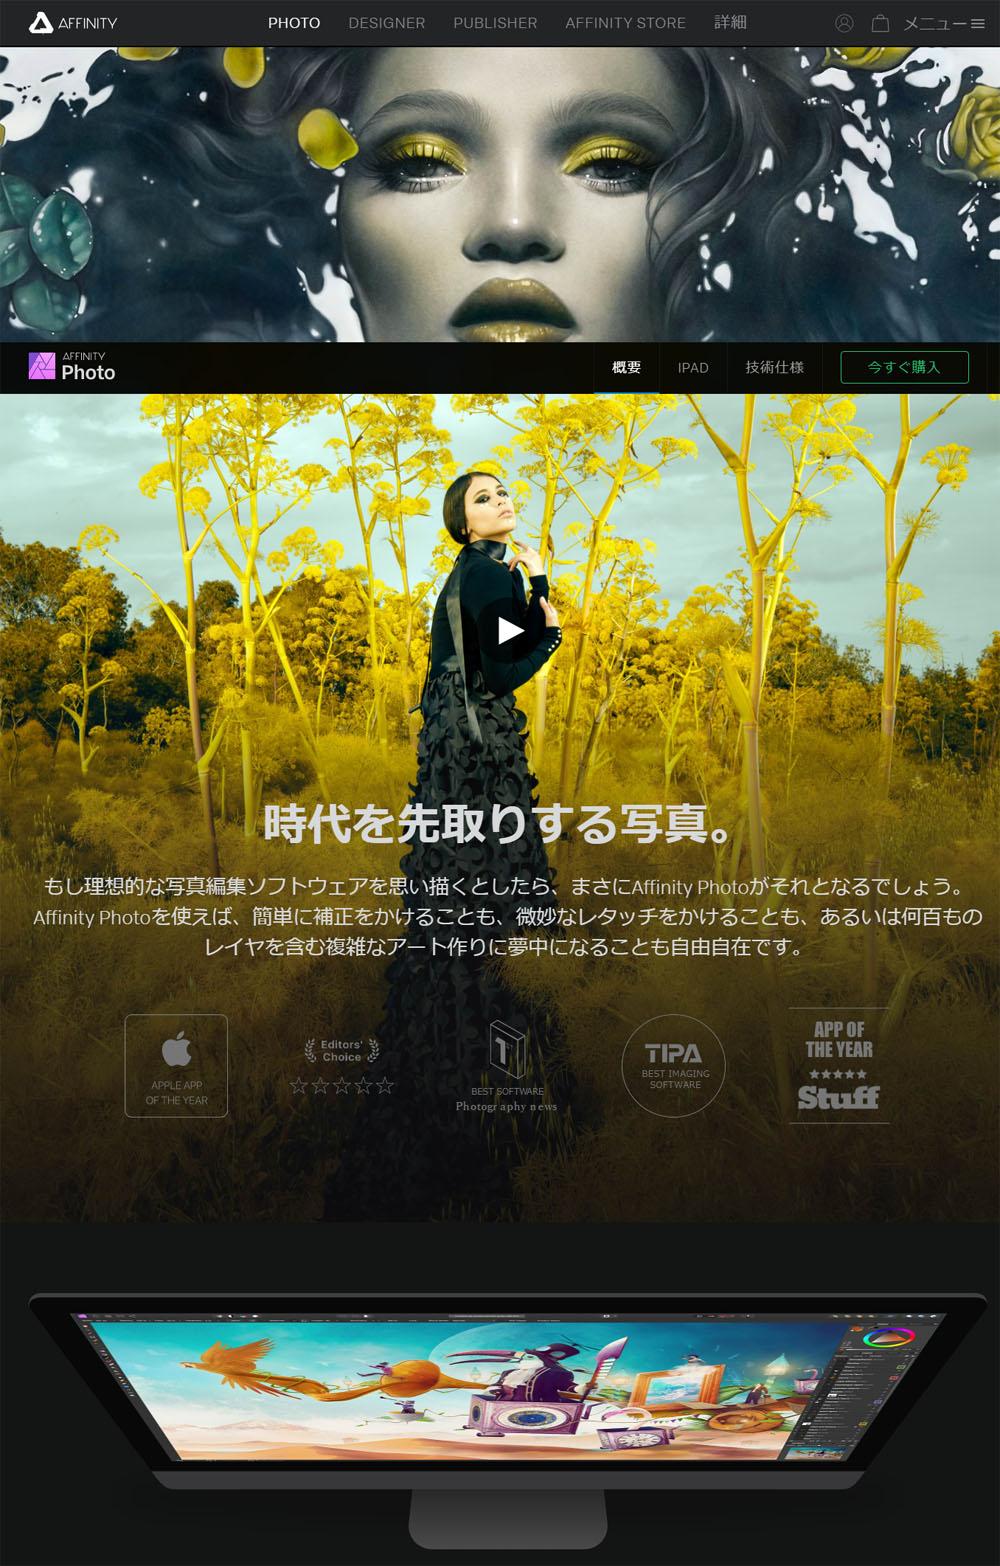 Affinity photoの公式サイトスクリーンショット